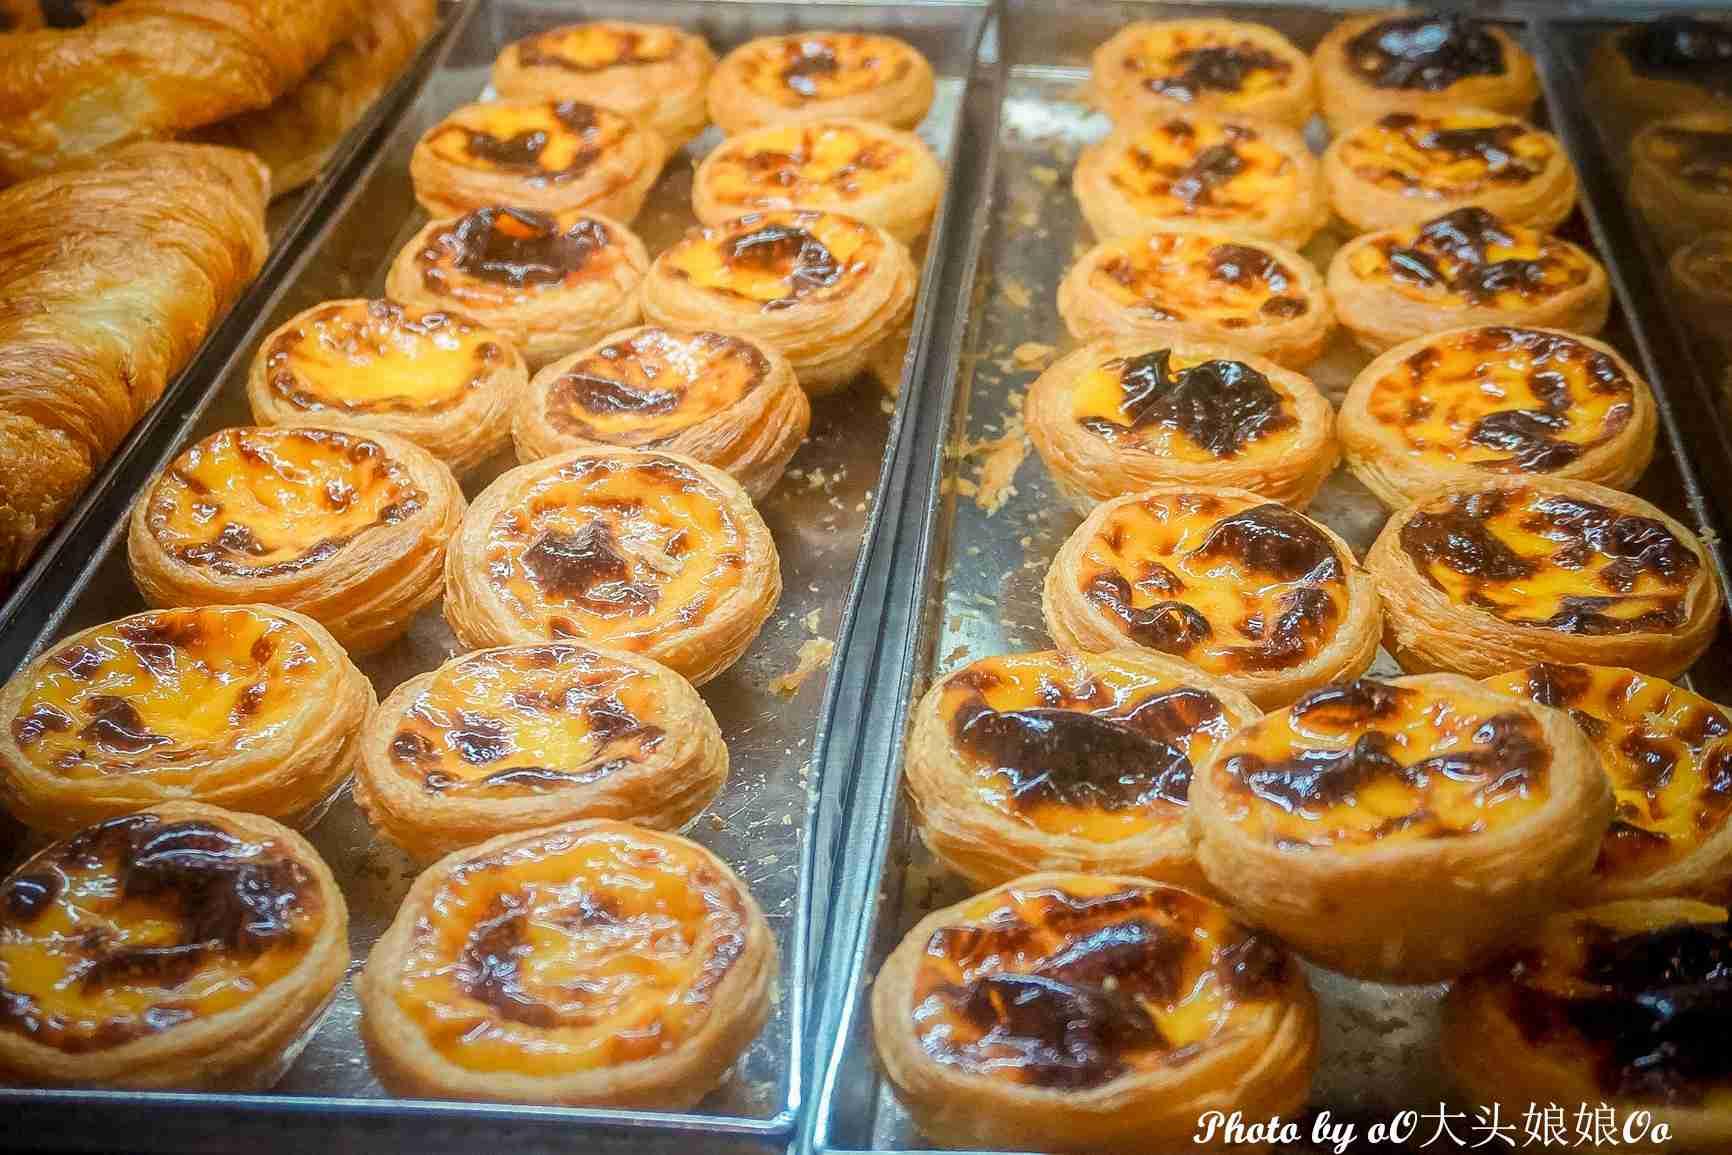 Pastel de nata__portuguese egg tart